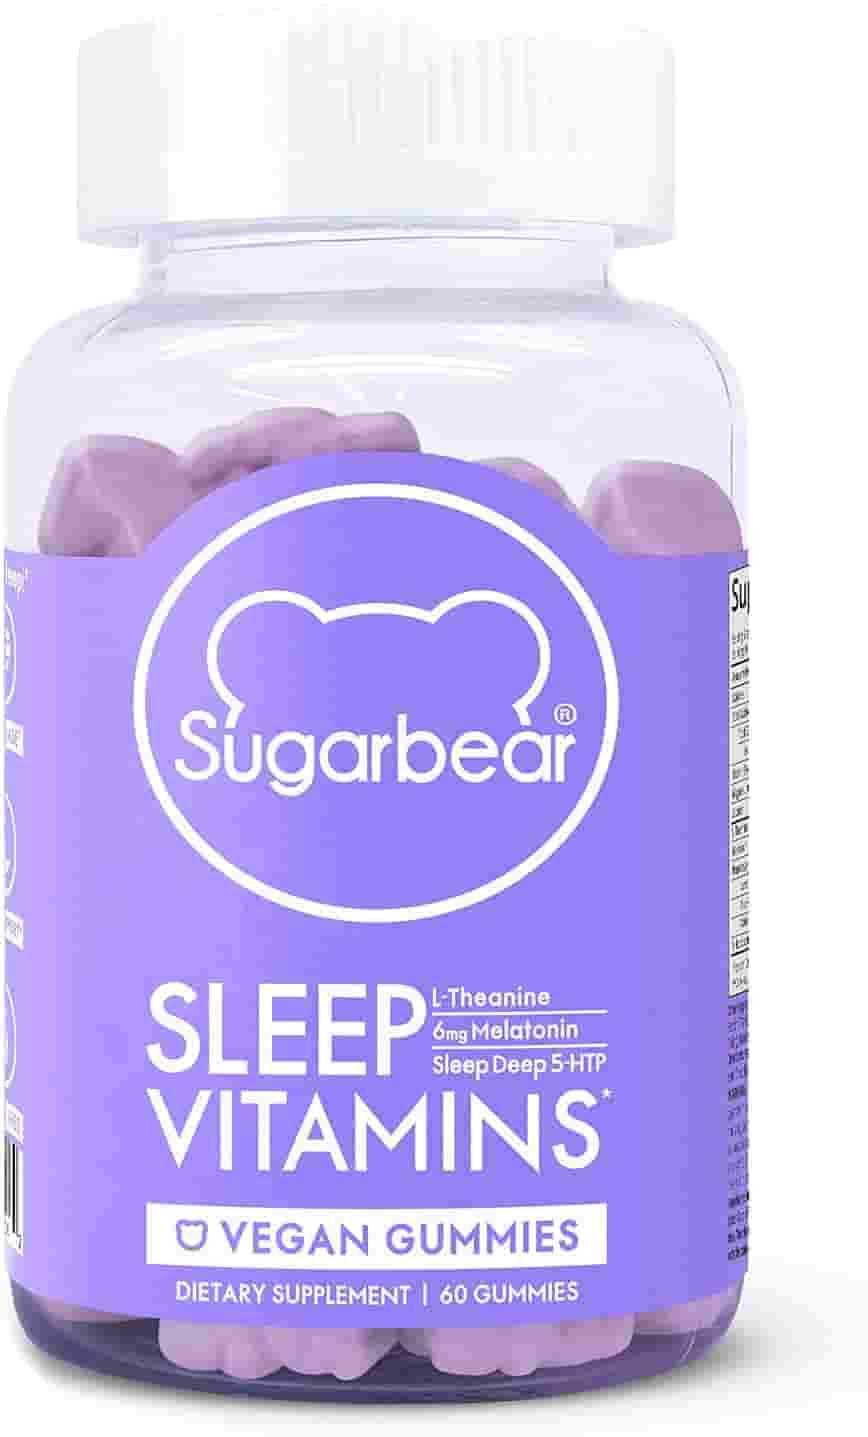 SugarBear Sleep, Vegan Gummy Vitamins with Melatonin